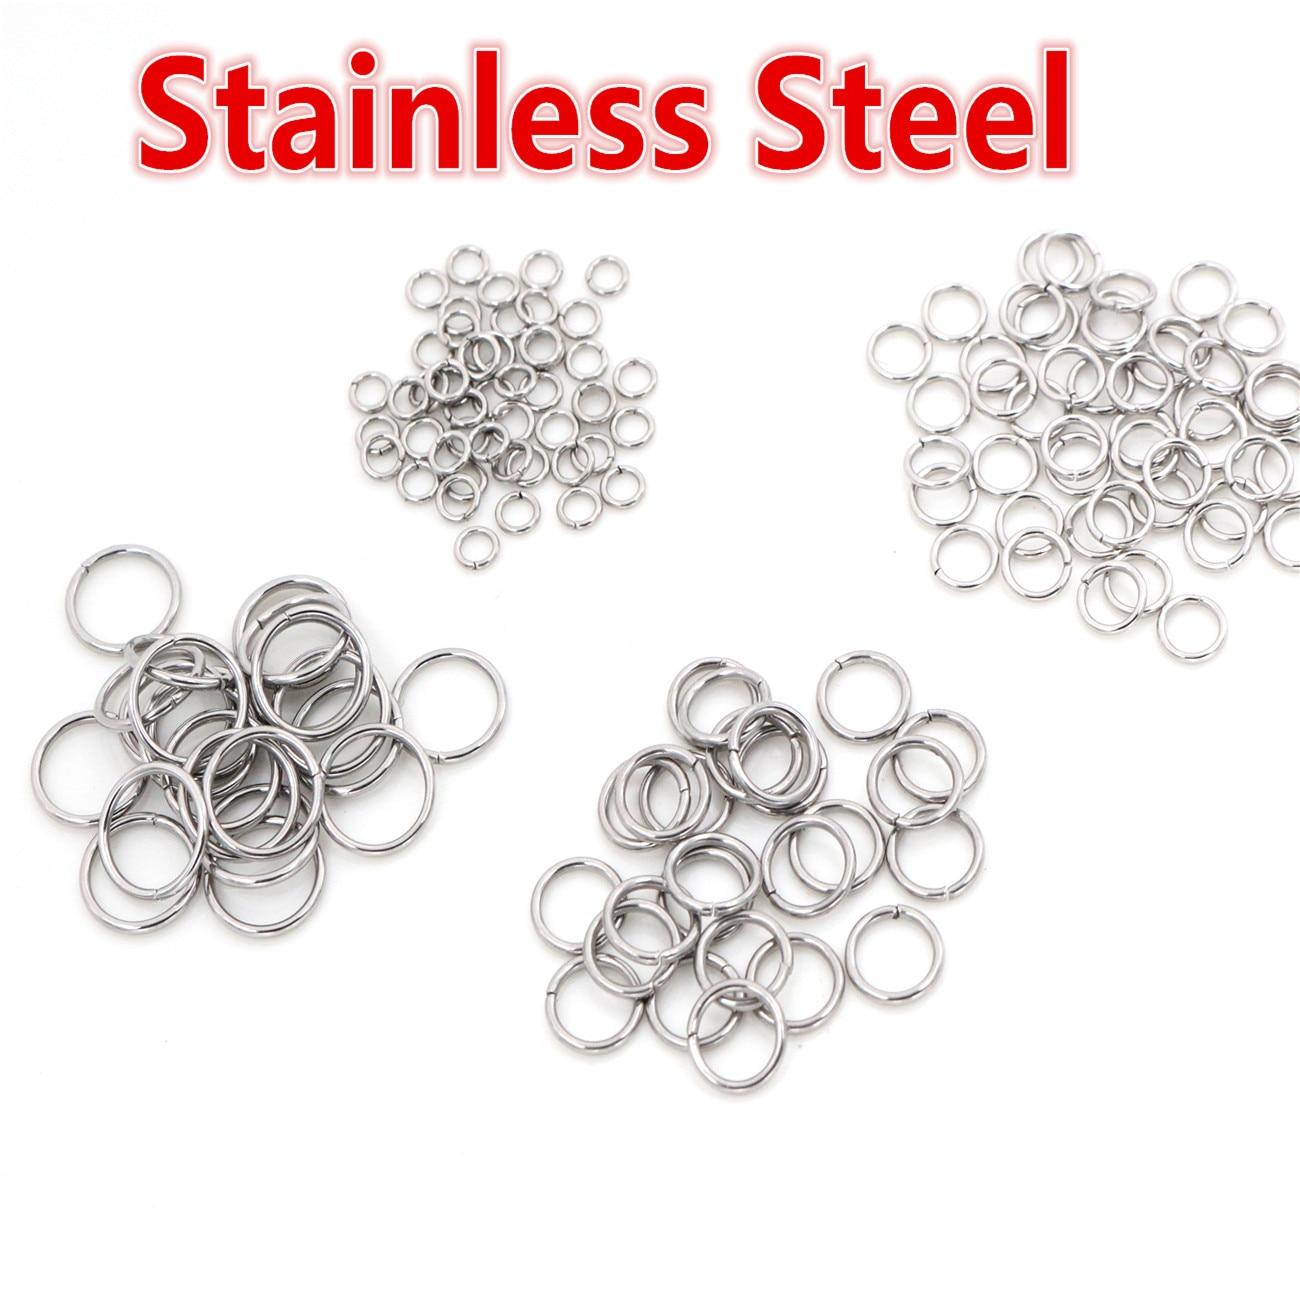 200 pçs/lote 3/4/5/6/7/8/10mm de aço inoxidável diy jóias descobertas aberto único loops salto anéis & split anel para fazer jóias